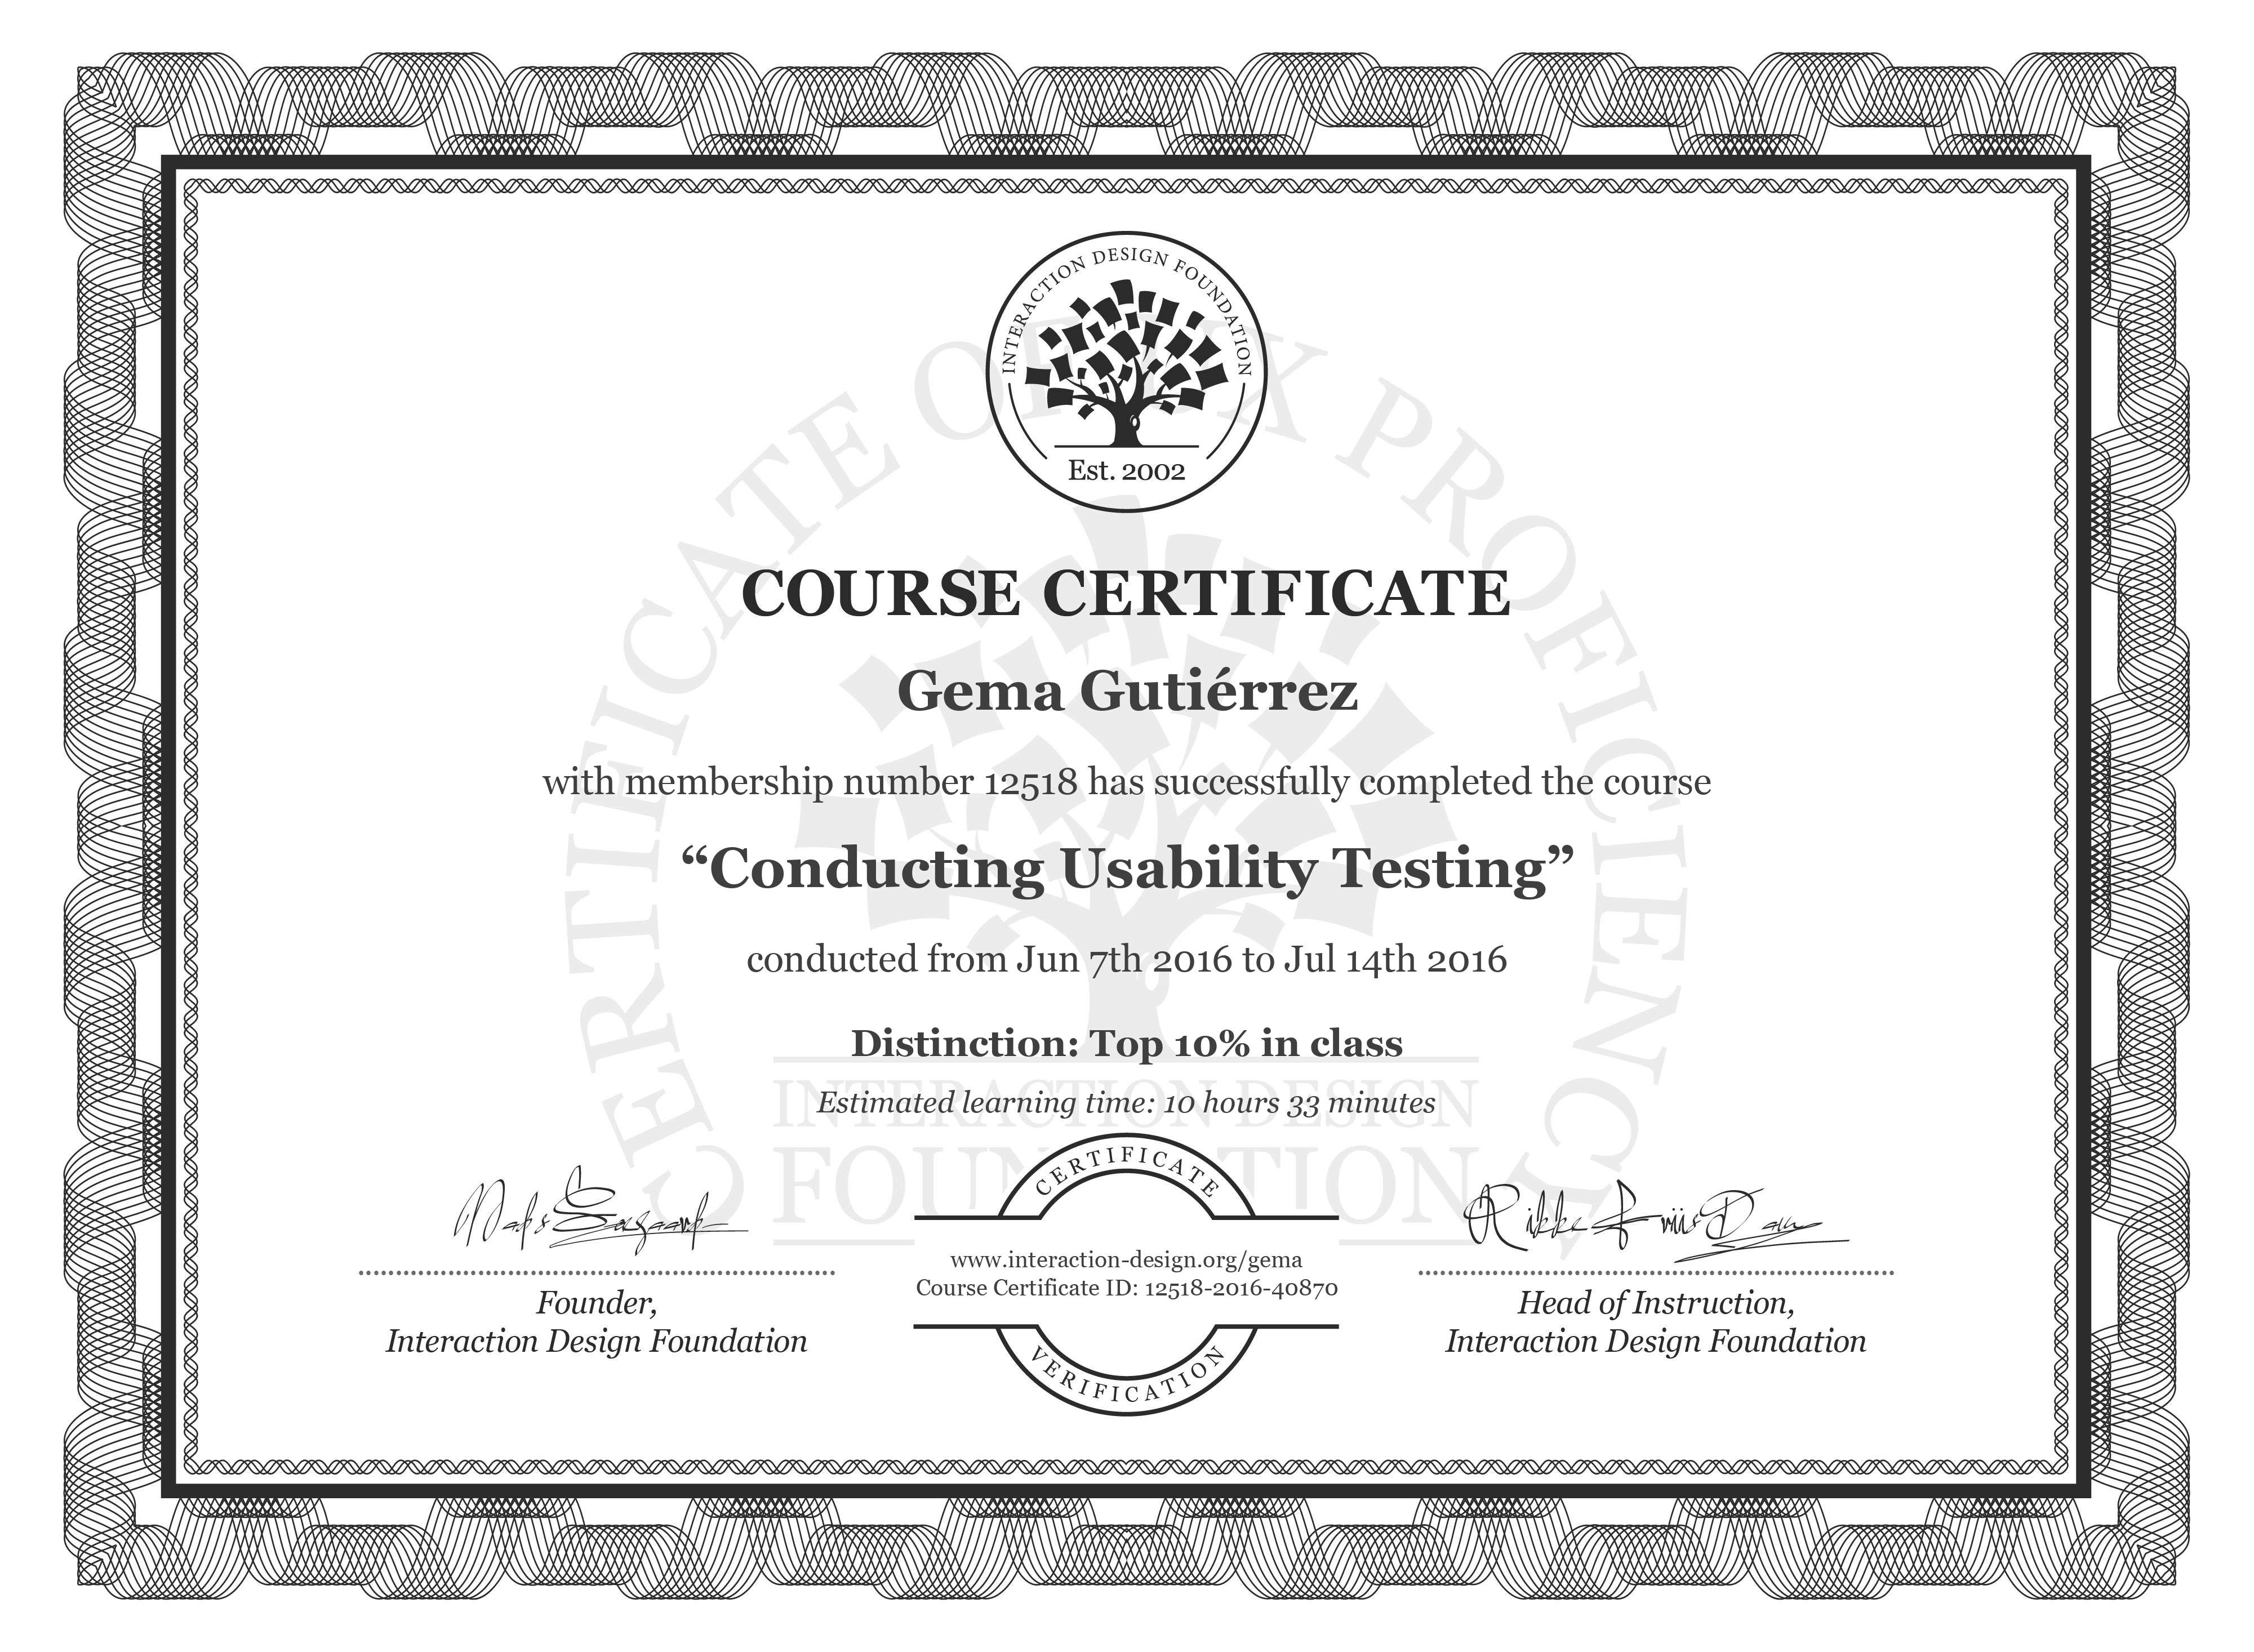 Gema Gutiérrez: Course Certificate - Conducting Usability Testing